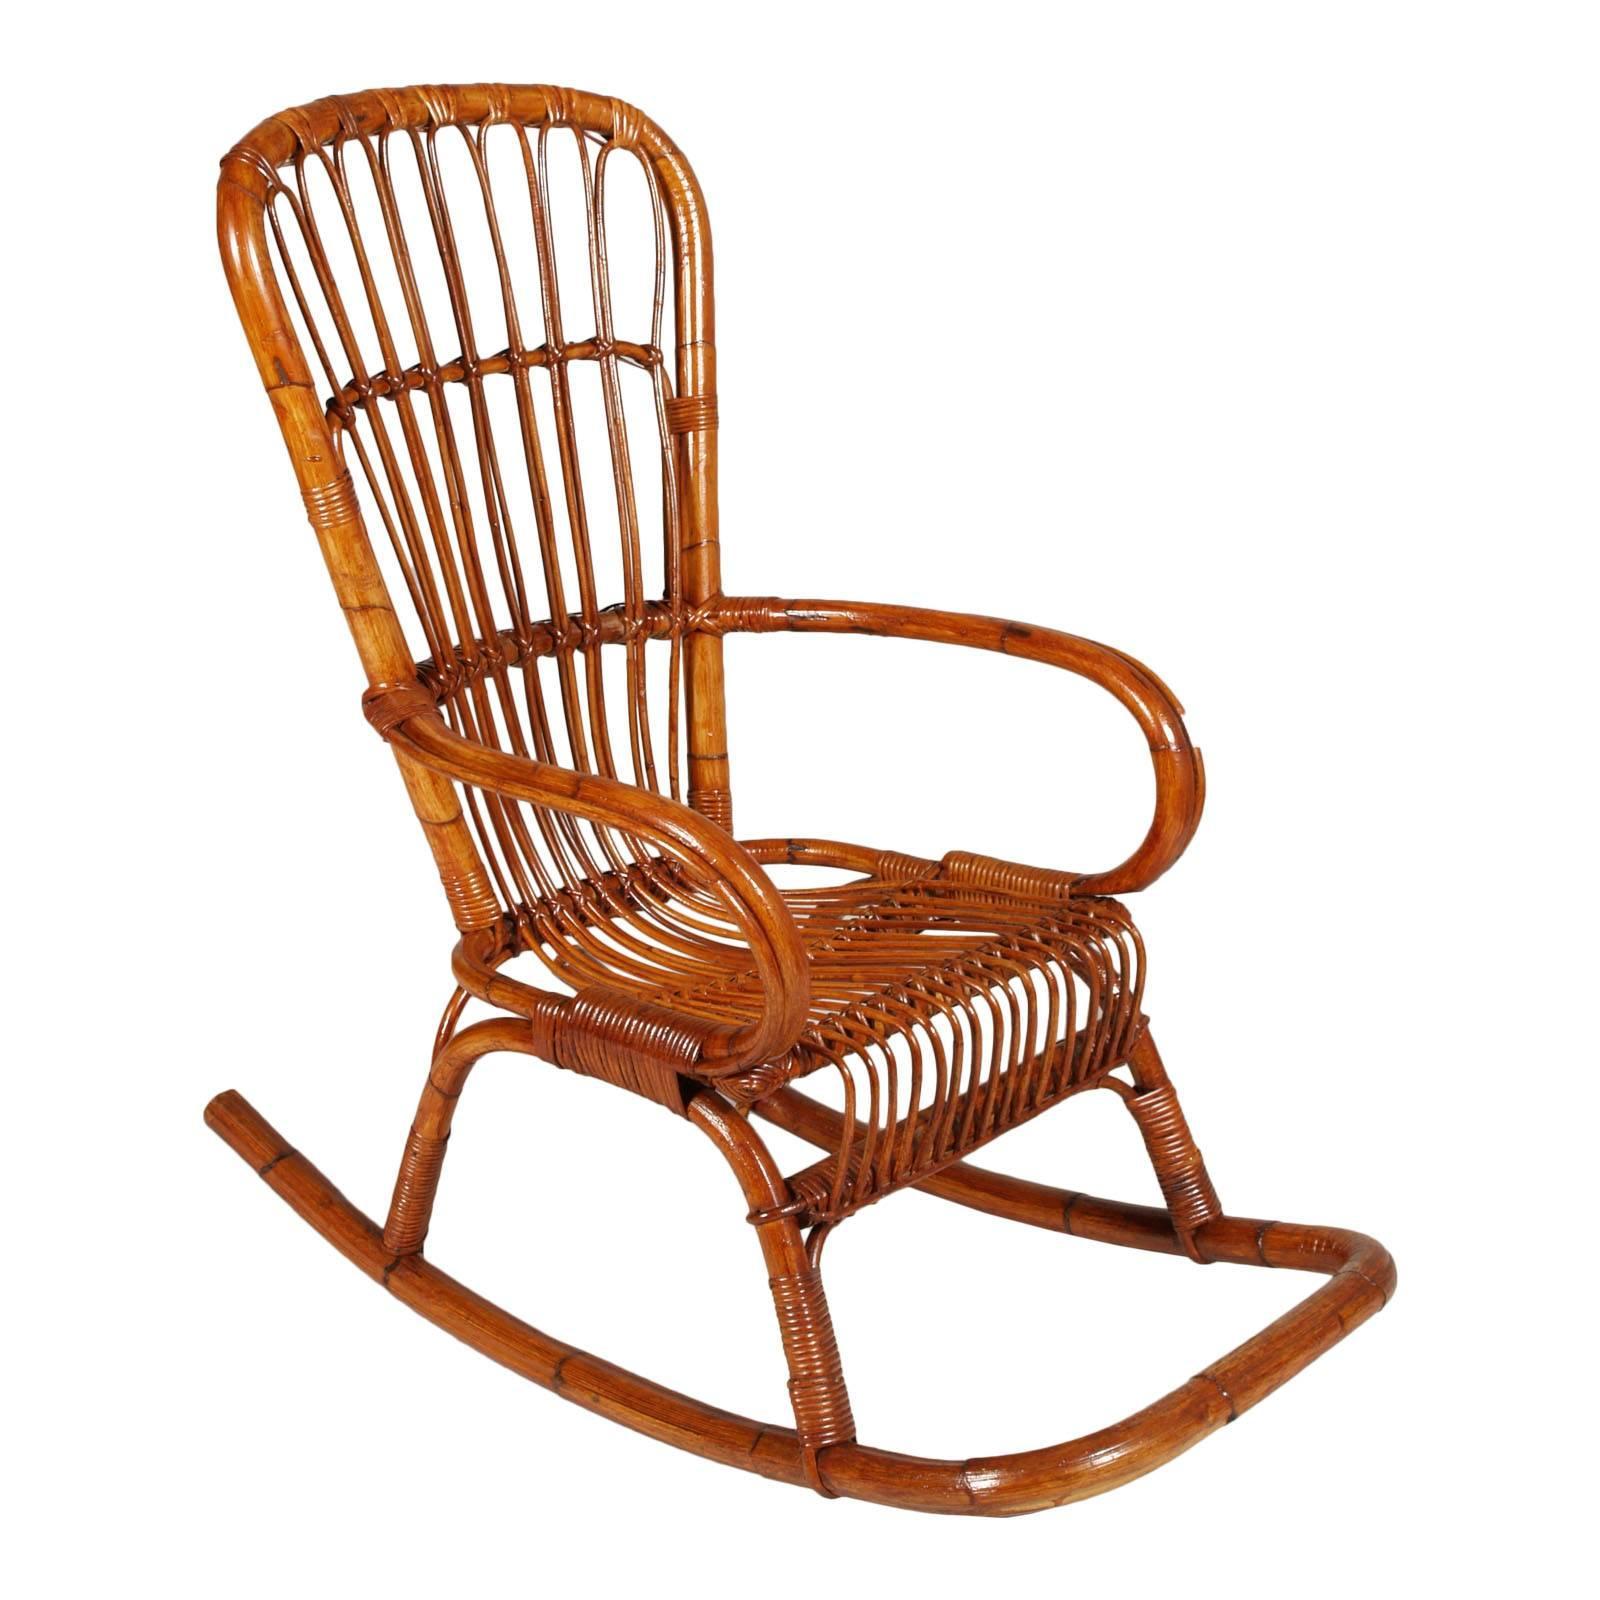 Italian Mid Century Modern Bamboo Rocking Chair Attributable Vittorio  Bonacina For Sale At 1stdibs